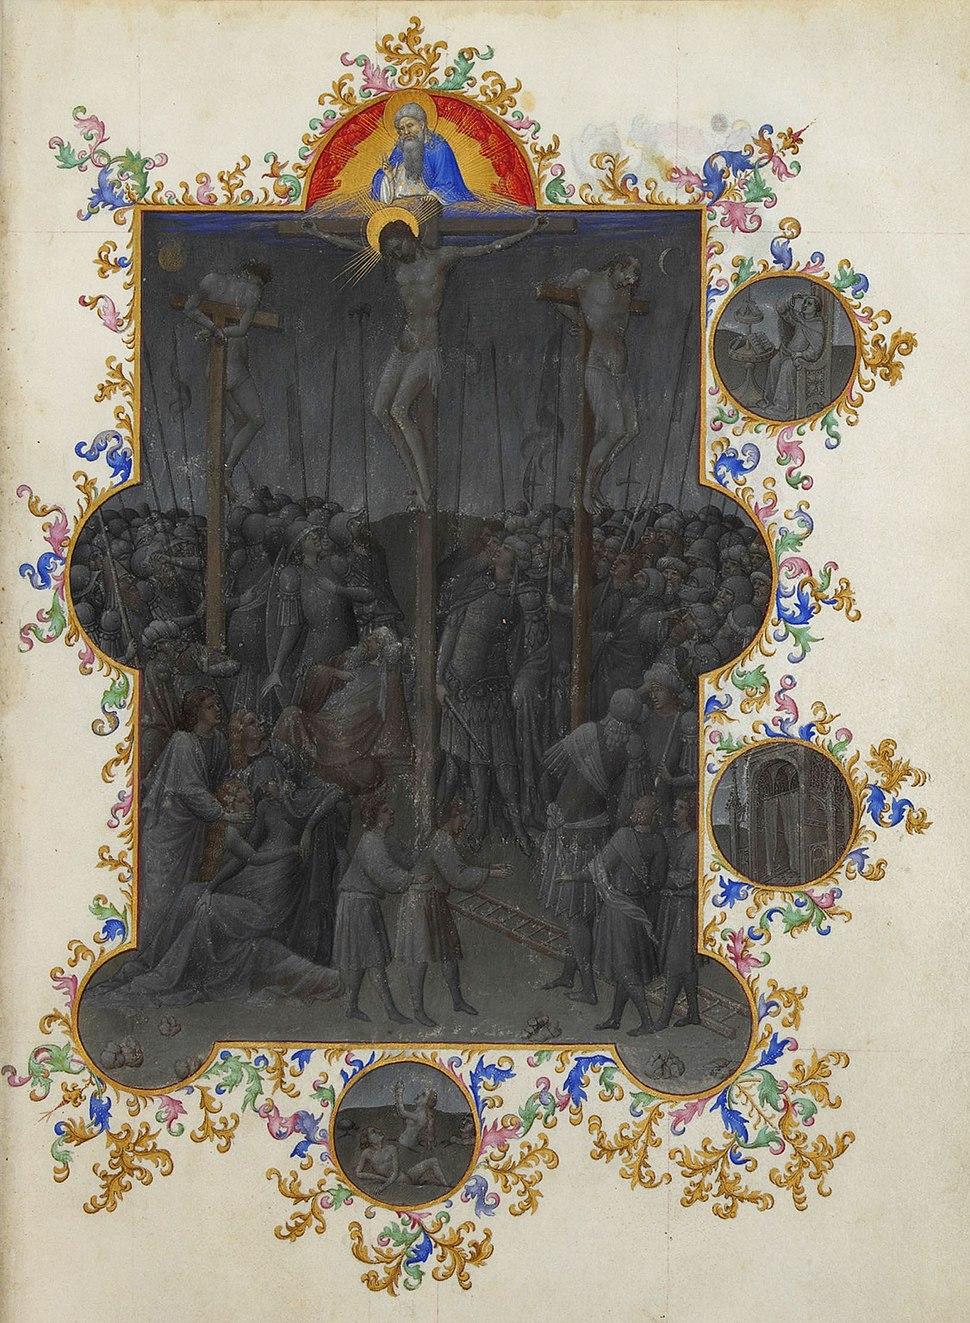 Folio 153r - The Death of Christ